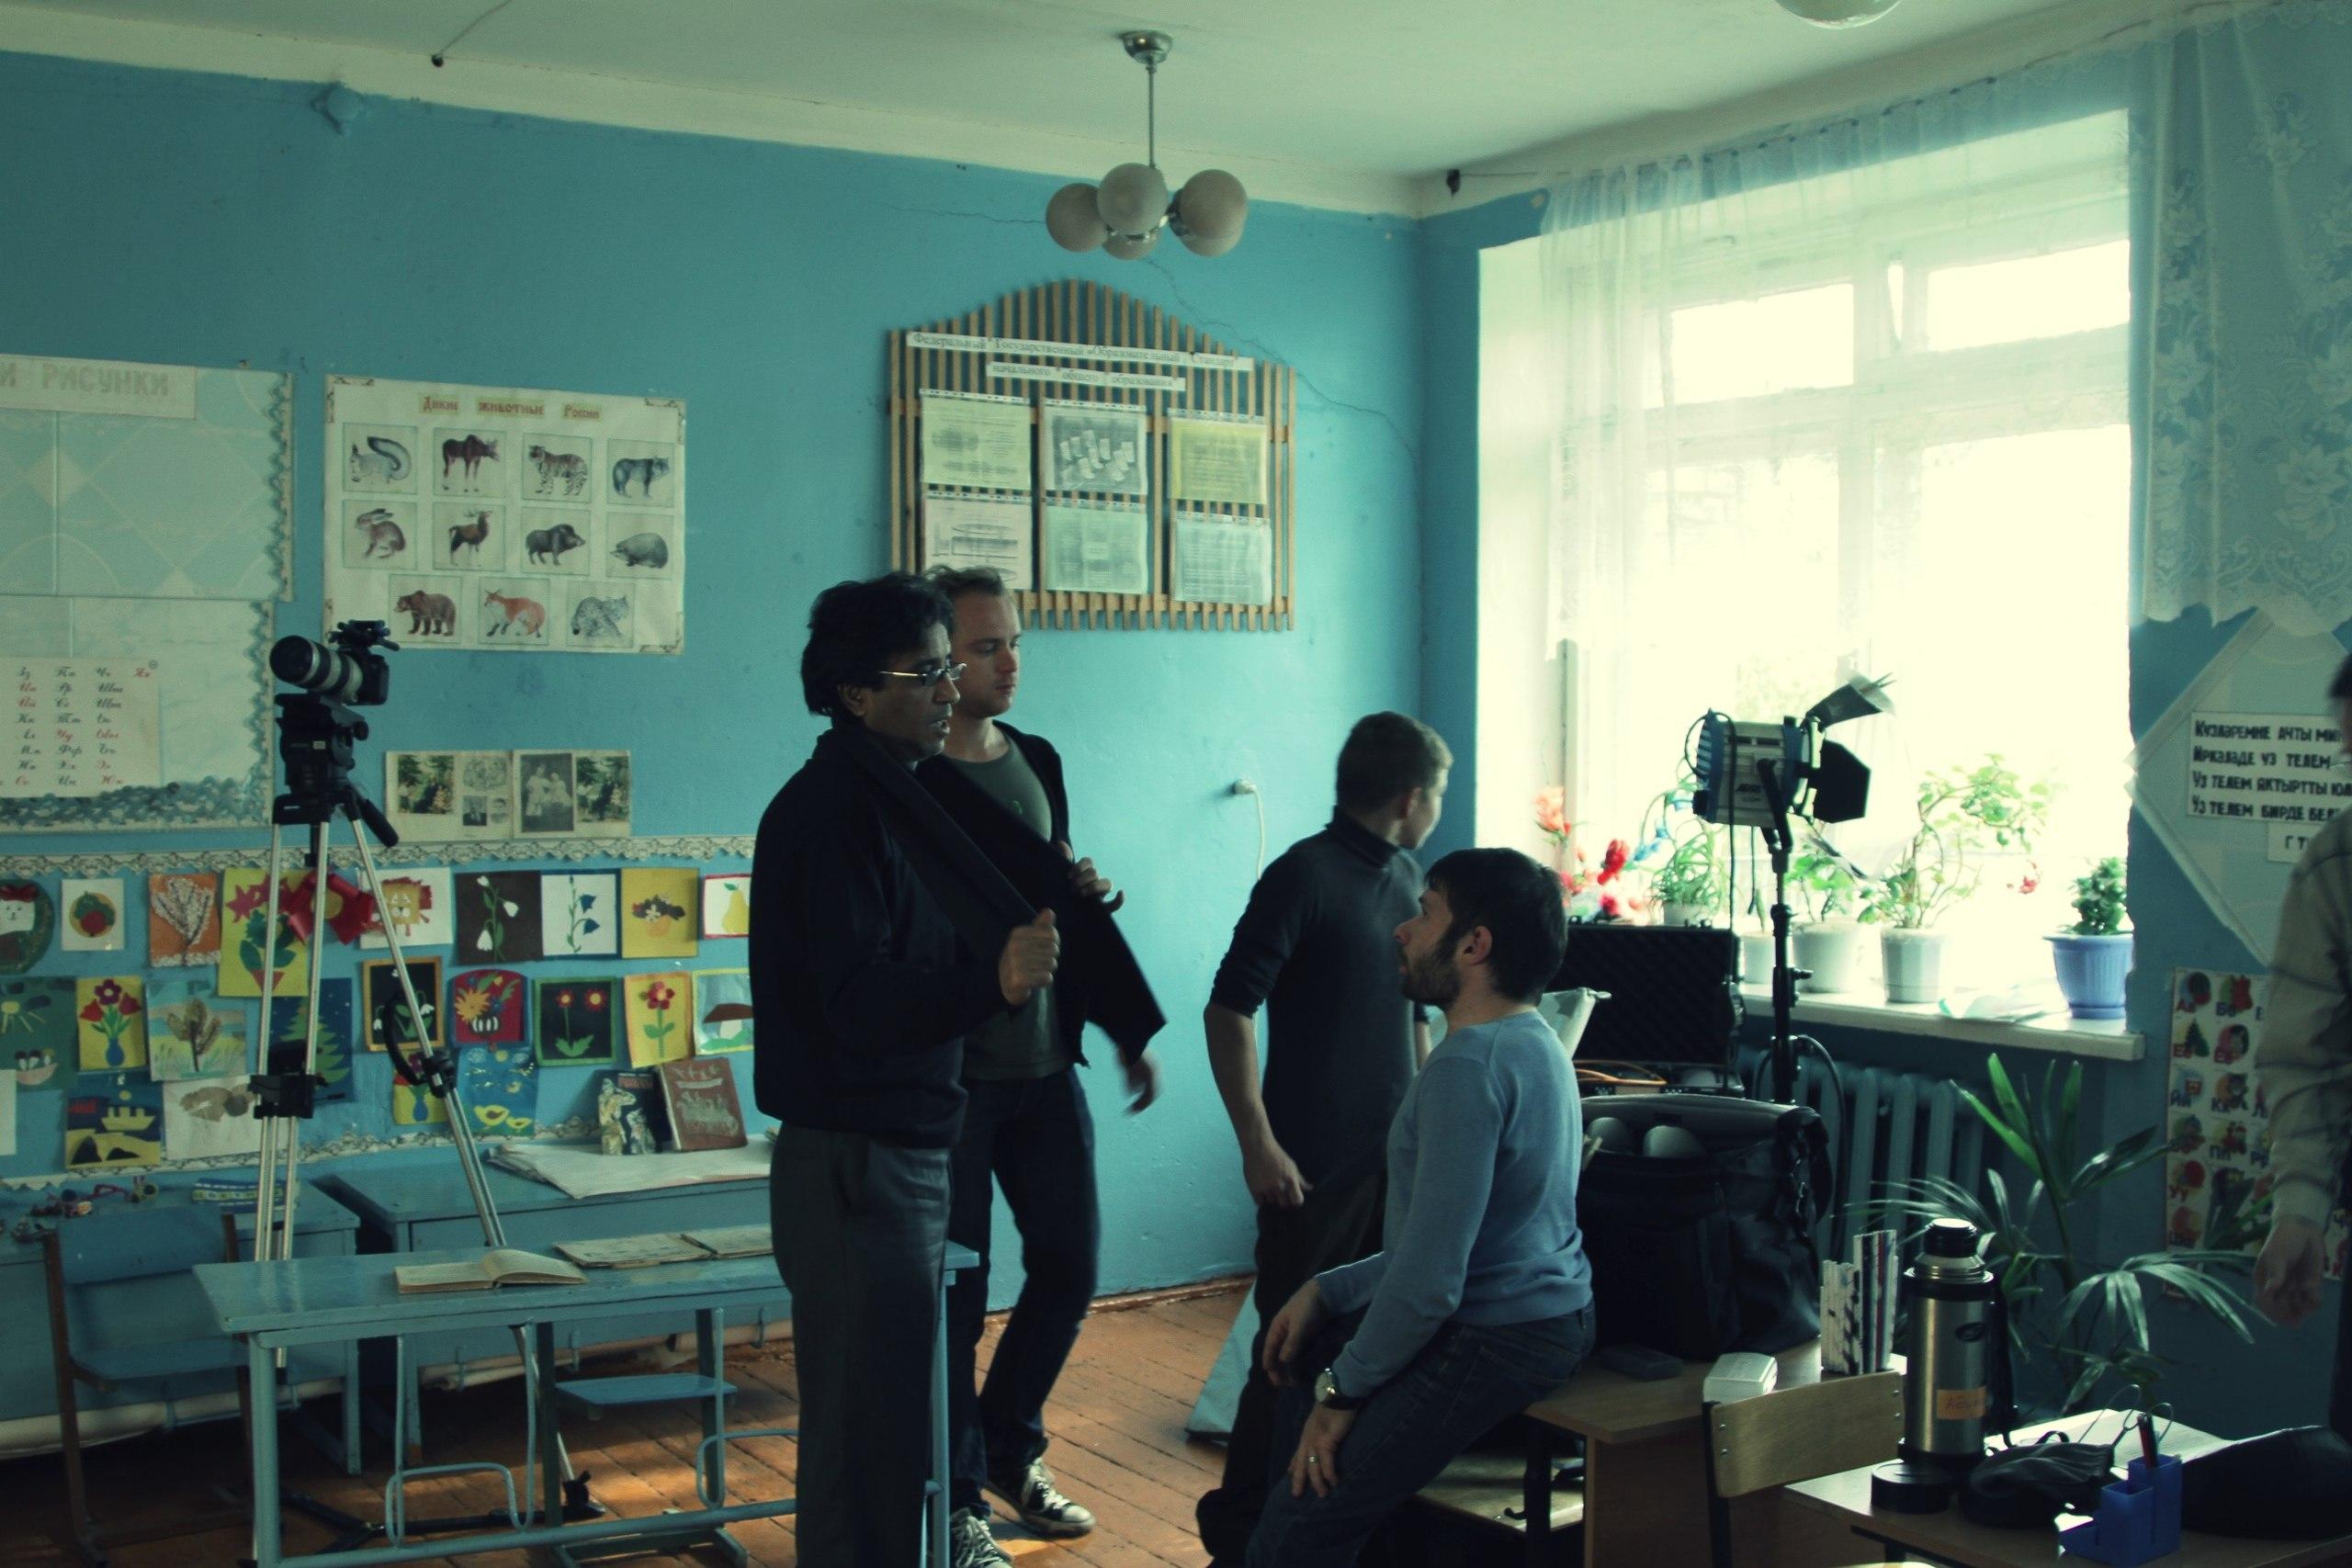 Muslims, Russia is proud of the first Film. Ahead of time. Haidar Musin, 2012_Ramil Khairulin 7